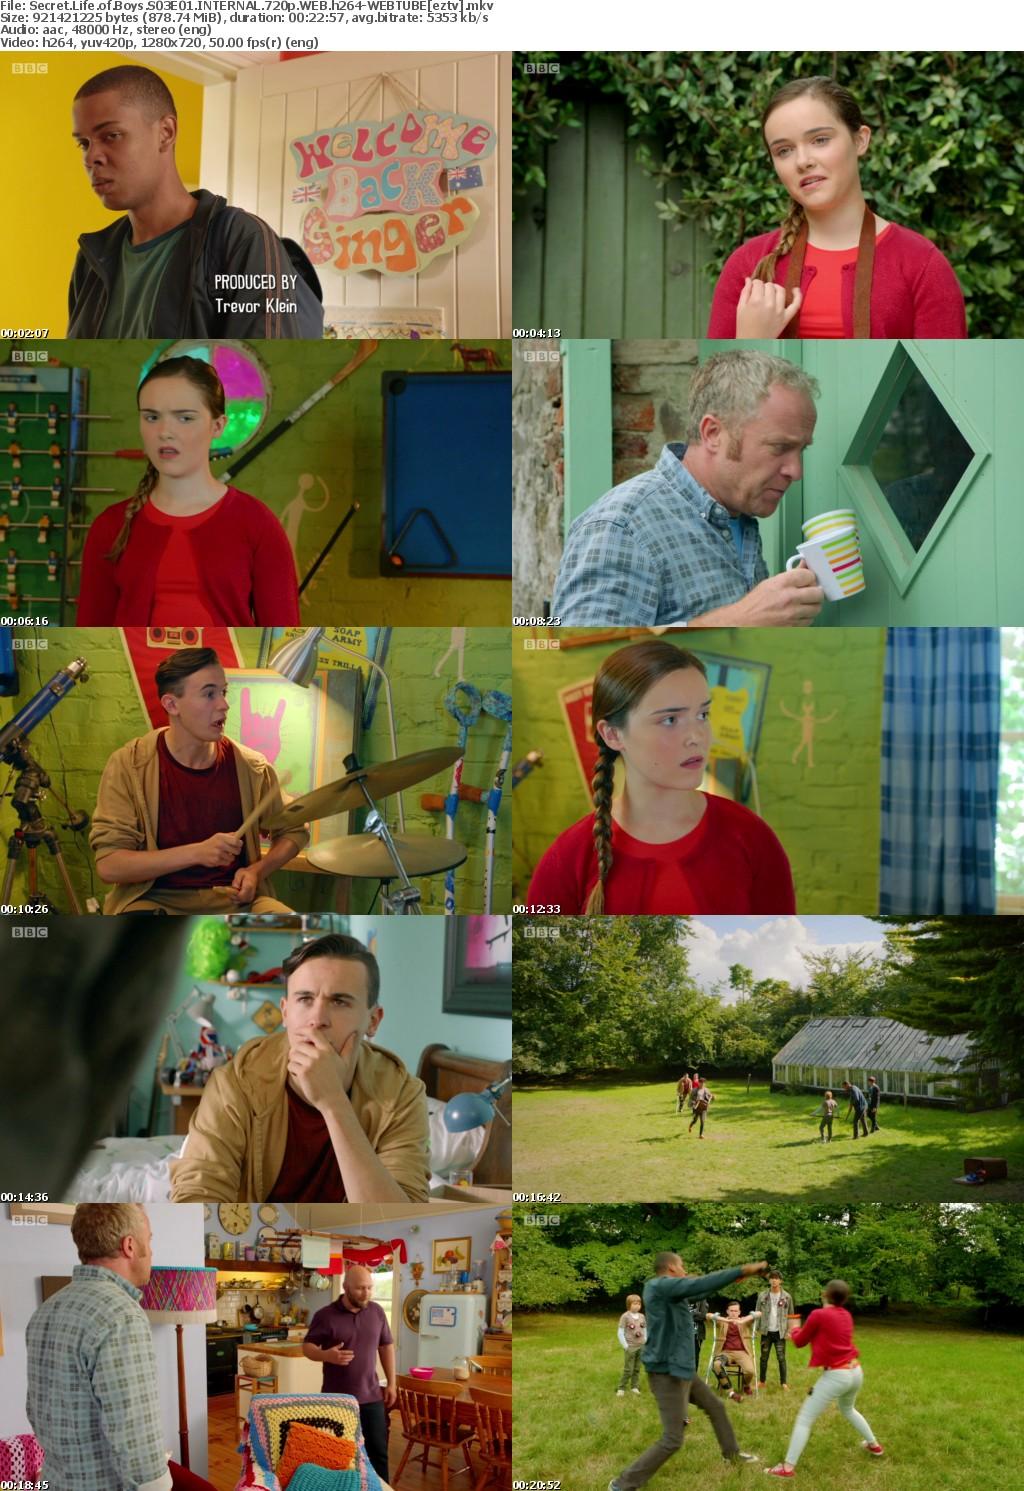 Secret Life of Boys S03E01 INTERNAL 720p WEB h264-WEBTUBE